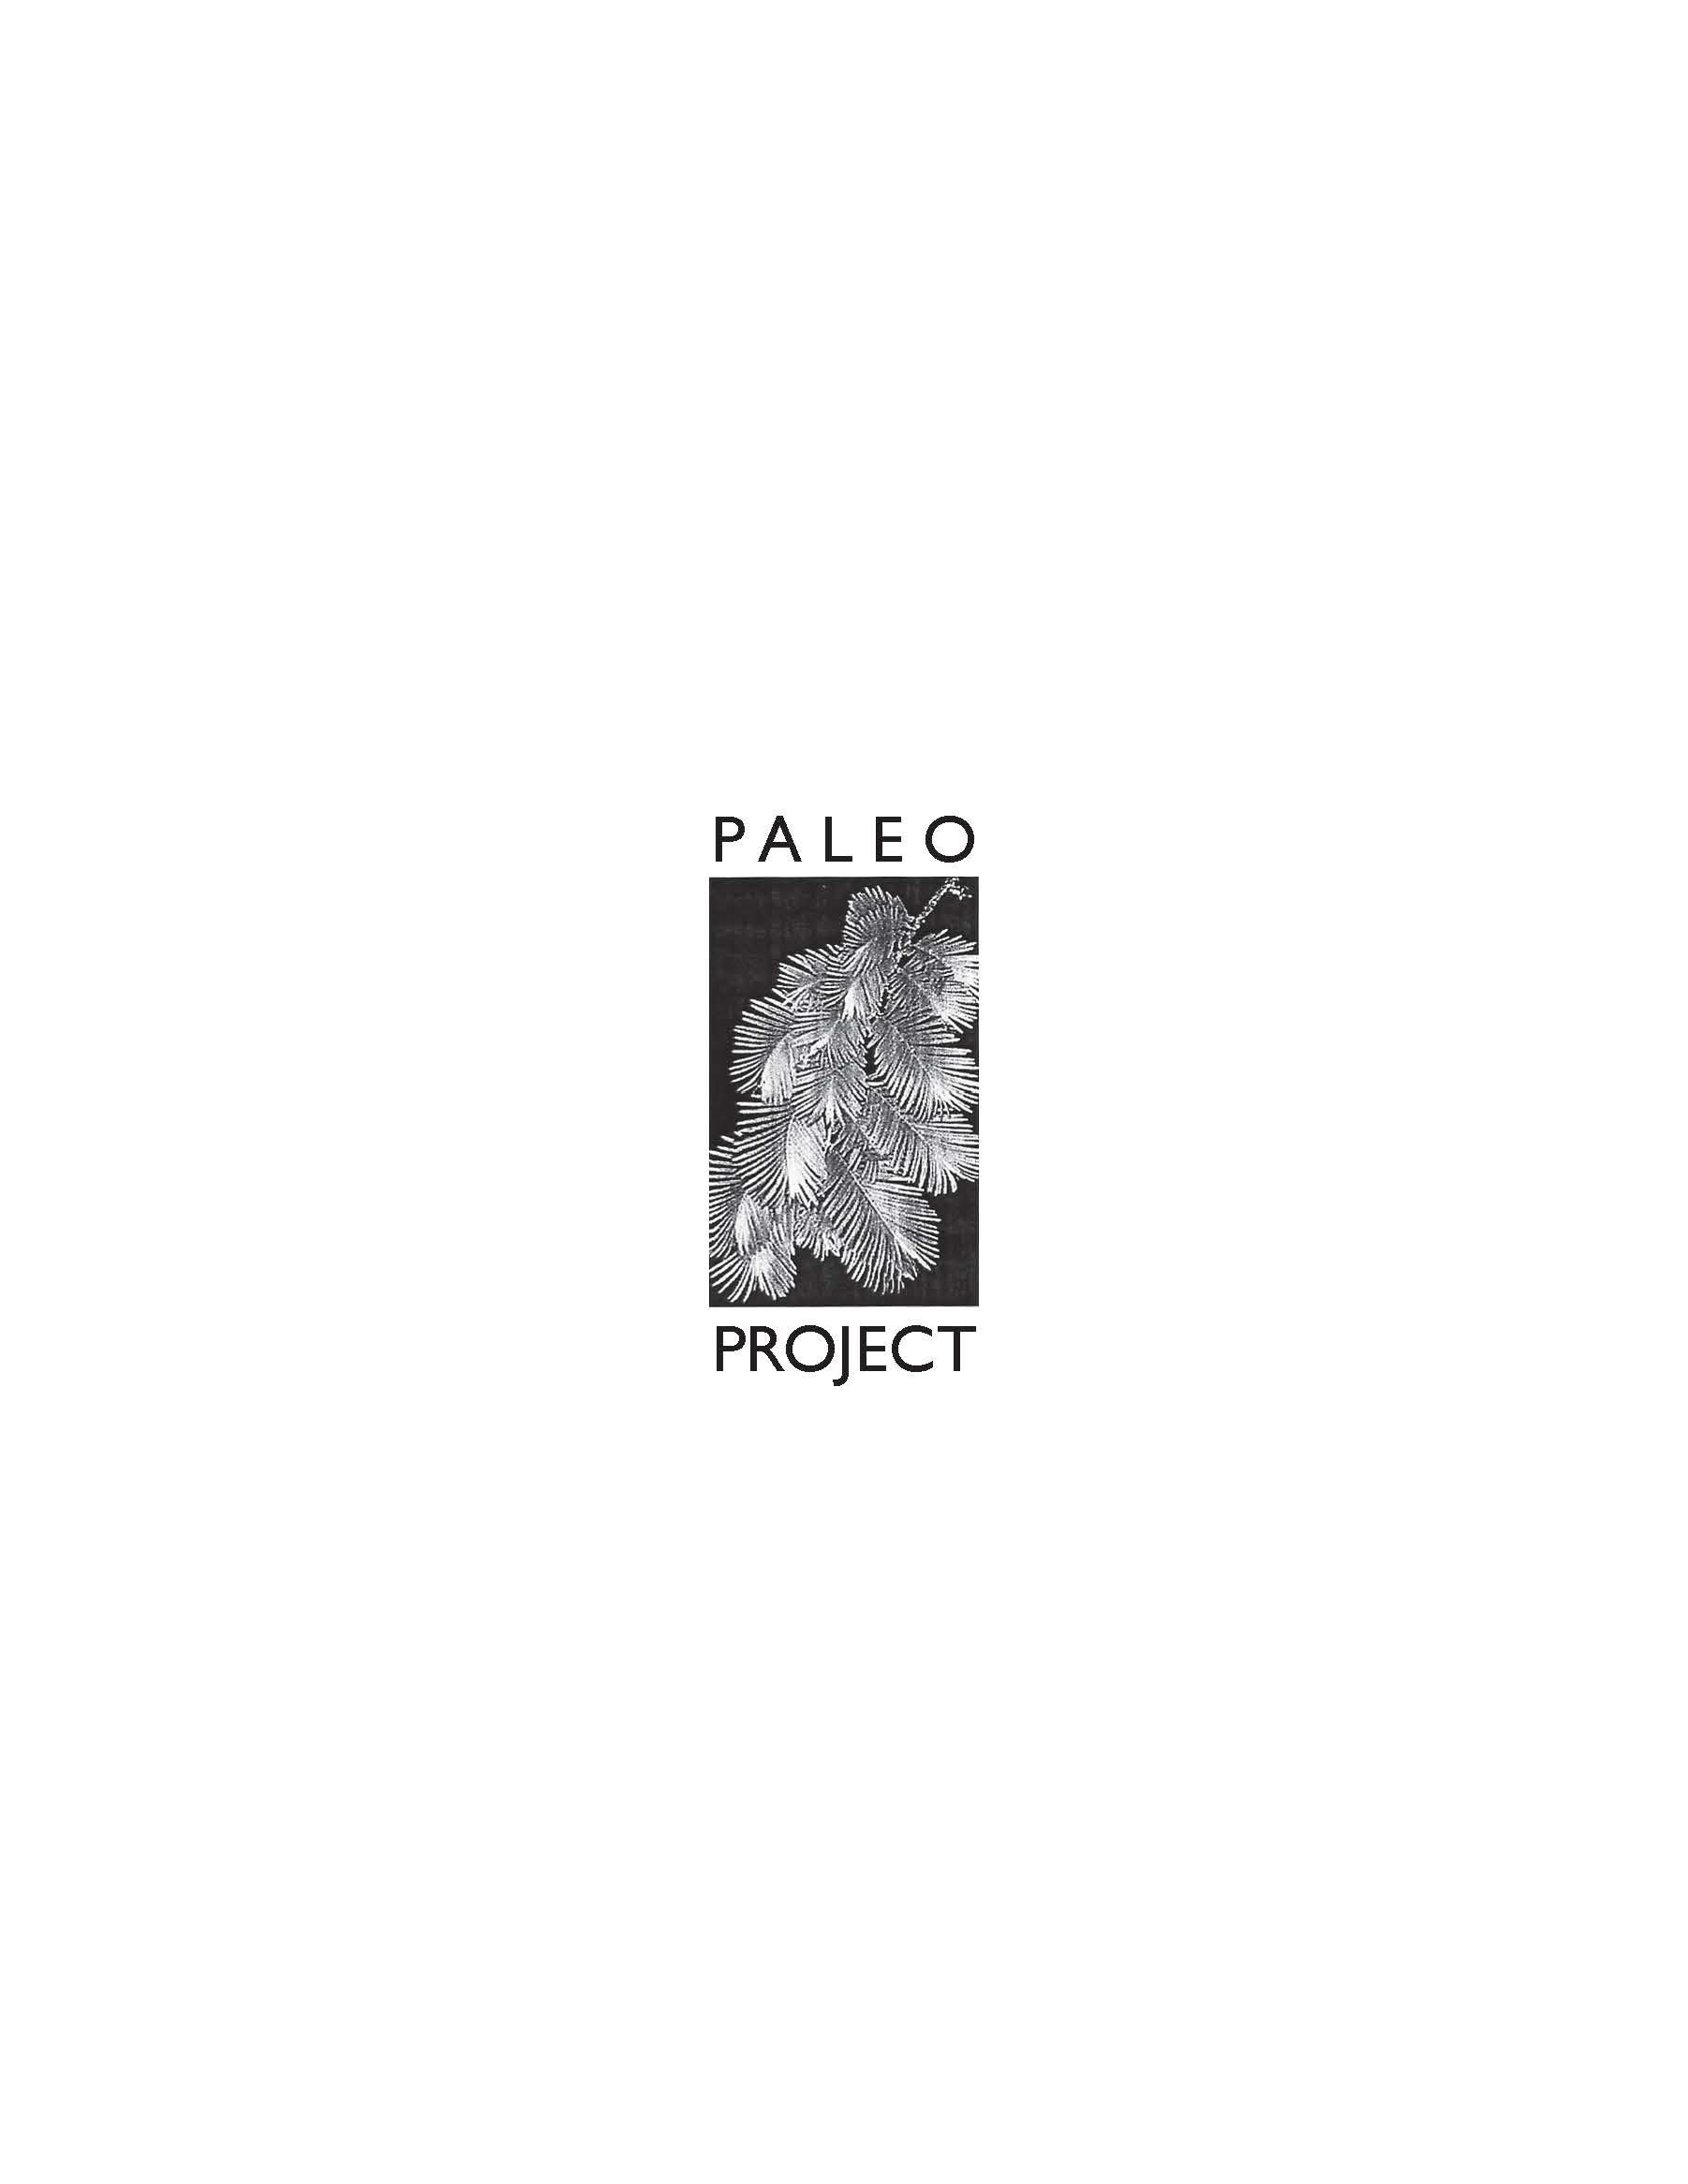 2005 EDRA Paleo Prospectus_Page_36.jpg